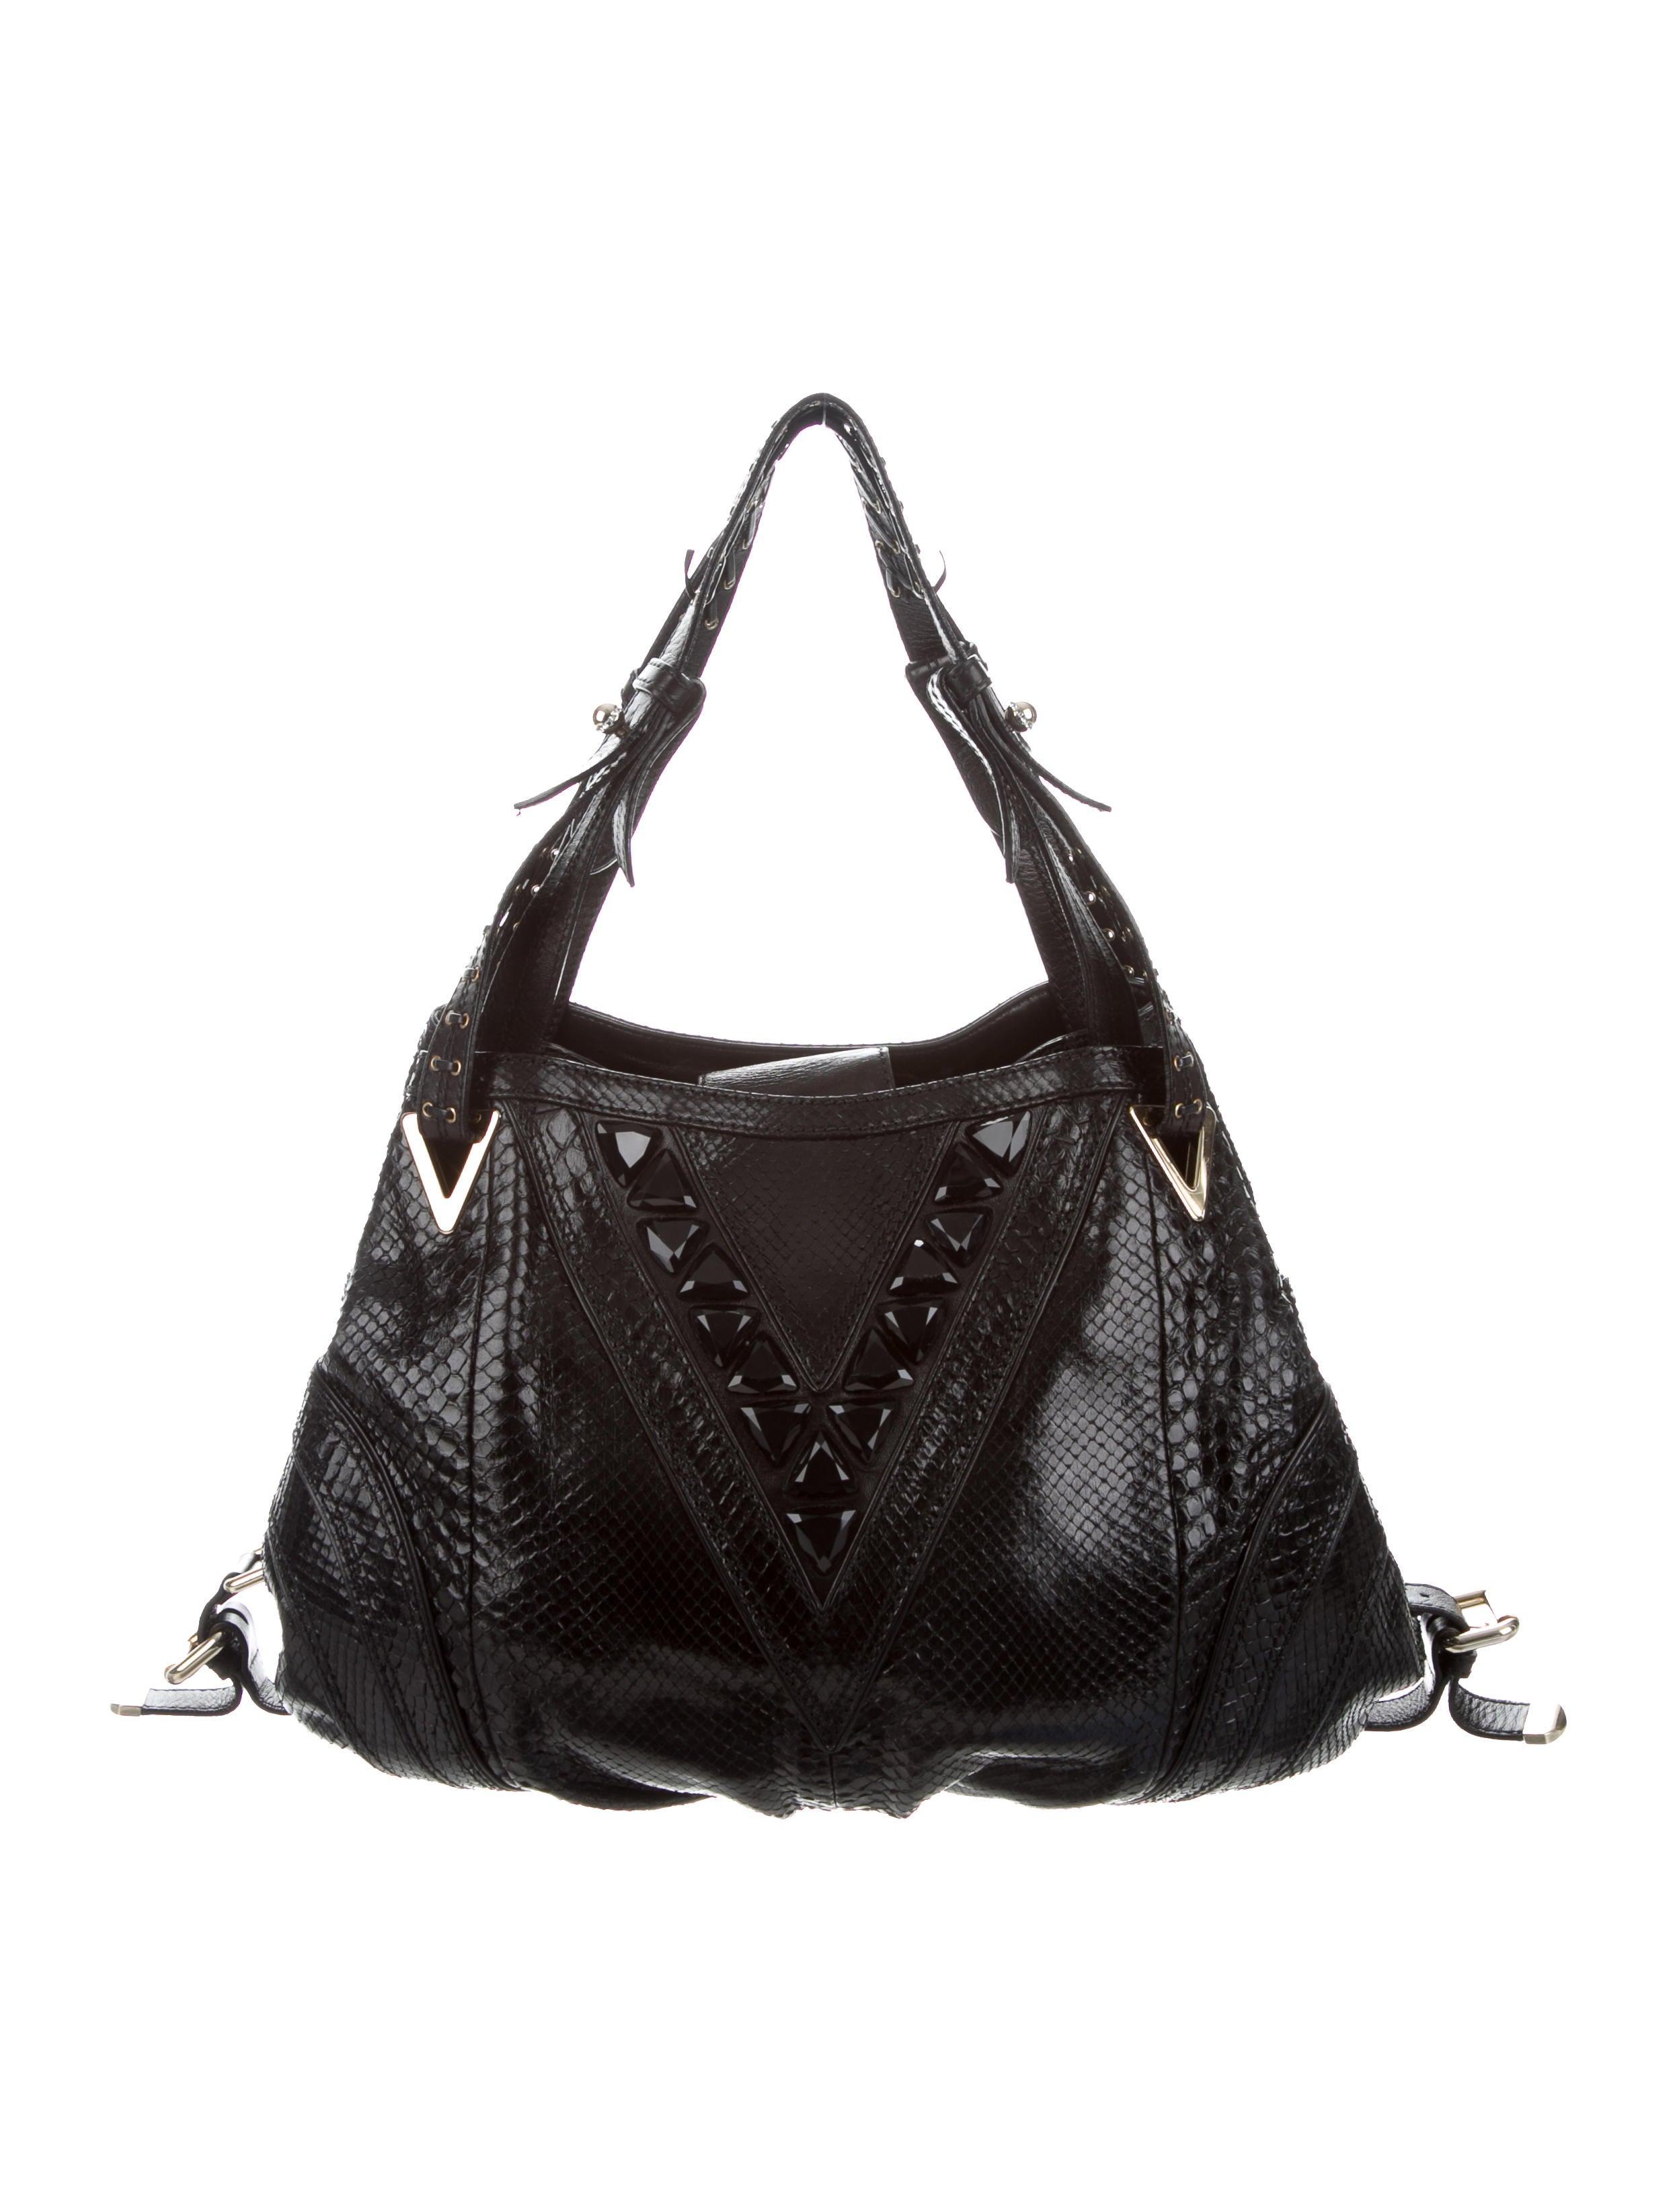 9a2a04d054 Versace Snakeskin Shoulder Bag - Handbags - VES39224